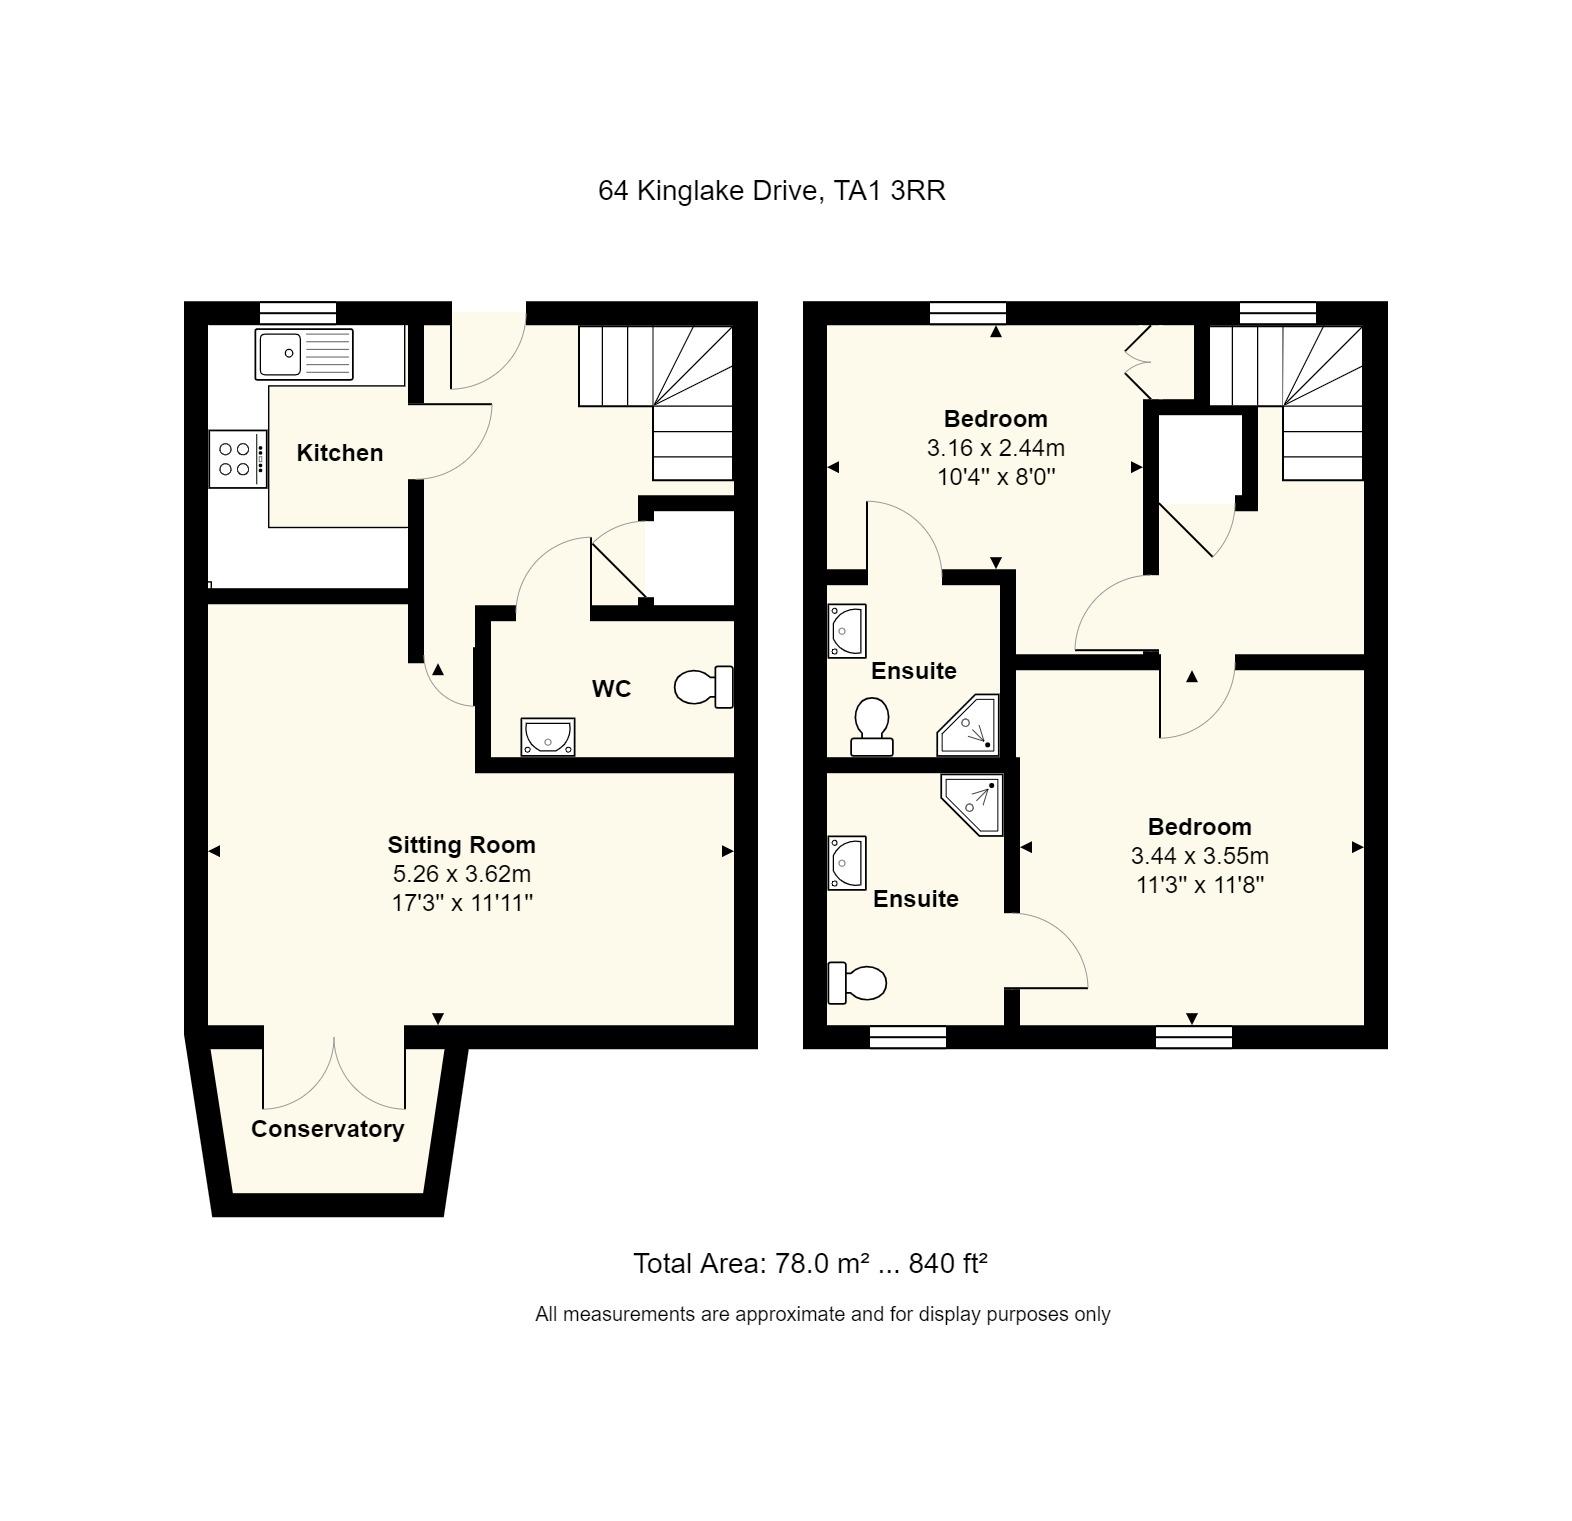 64 Kinglake Drive Floorplan